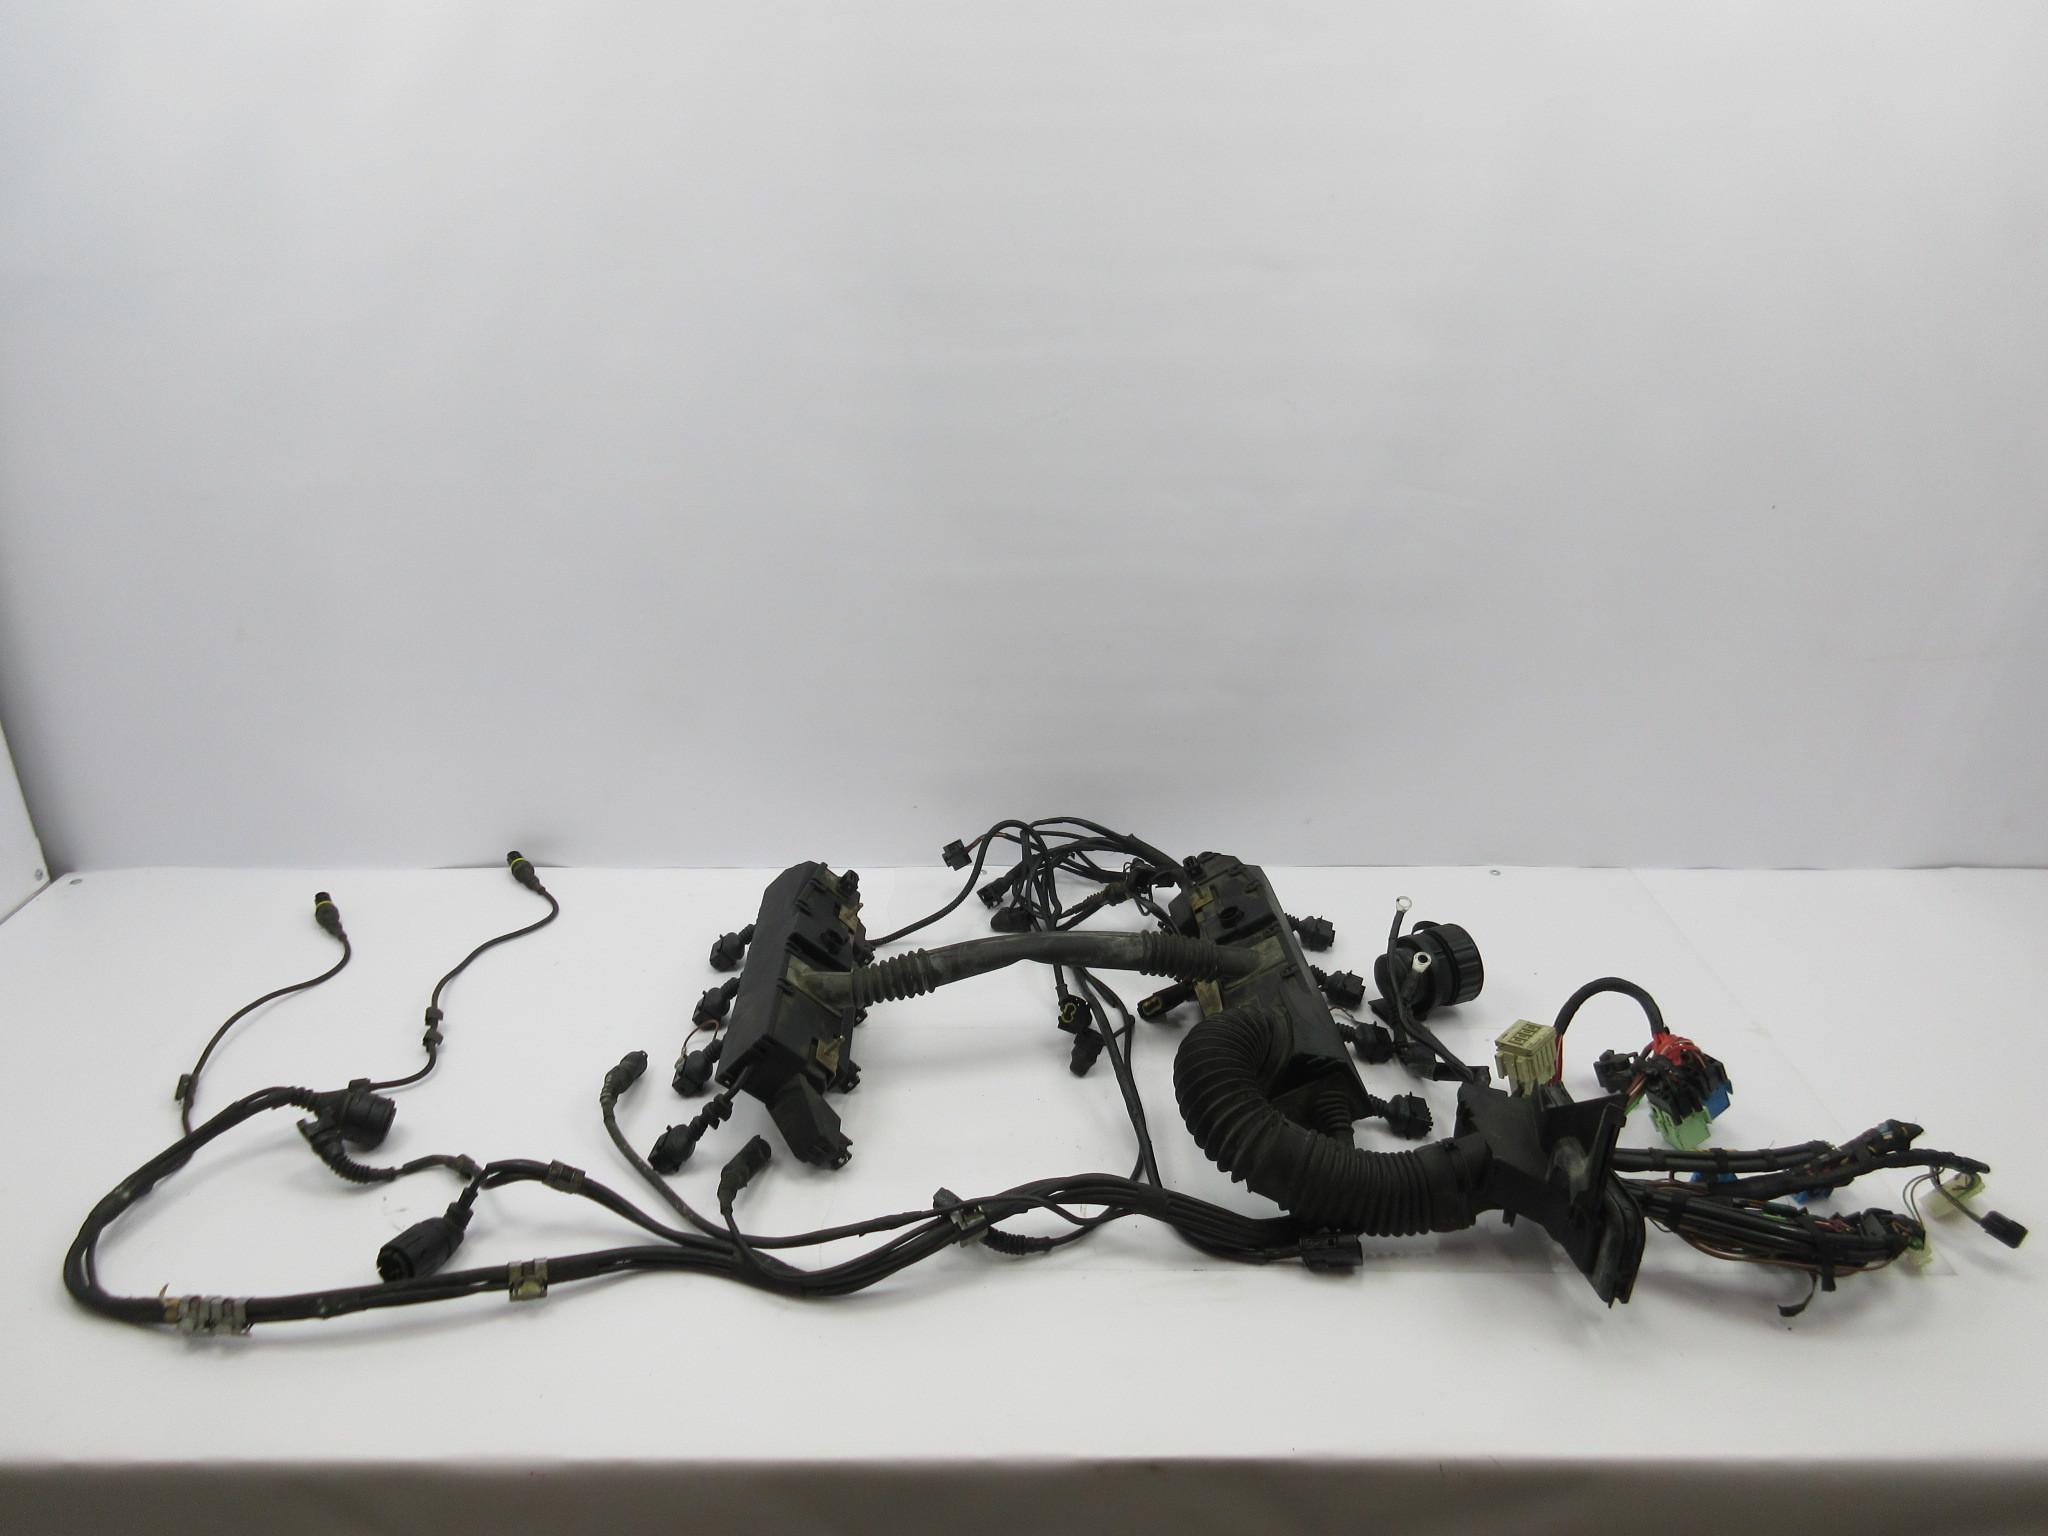 2000 Bmw 740il 740i E38 1035 Engine Motor Wire Wiring Harness M62 Uncut Pk Auto Parts Inc